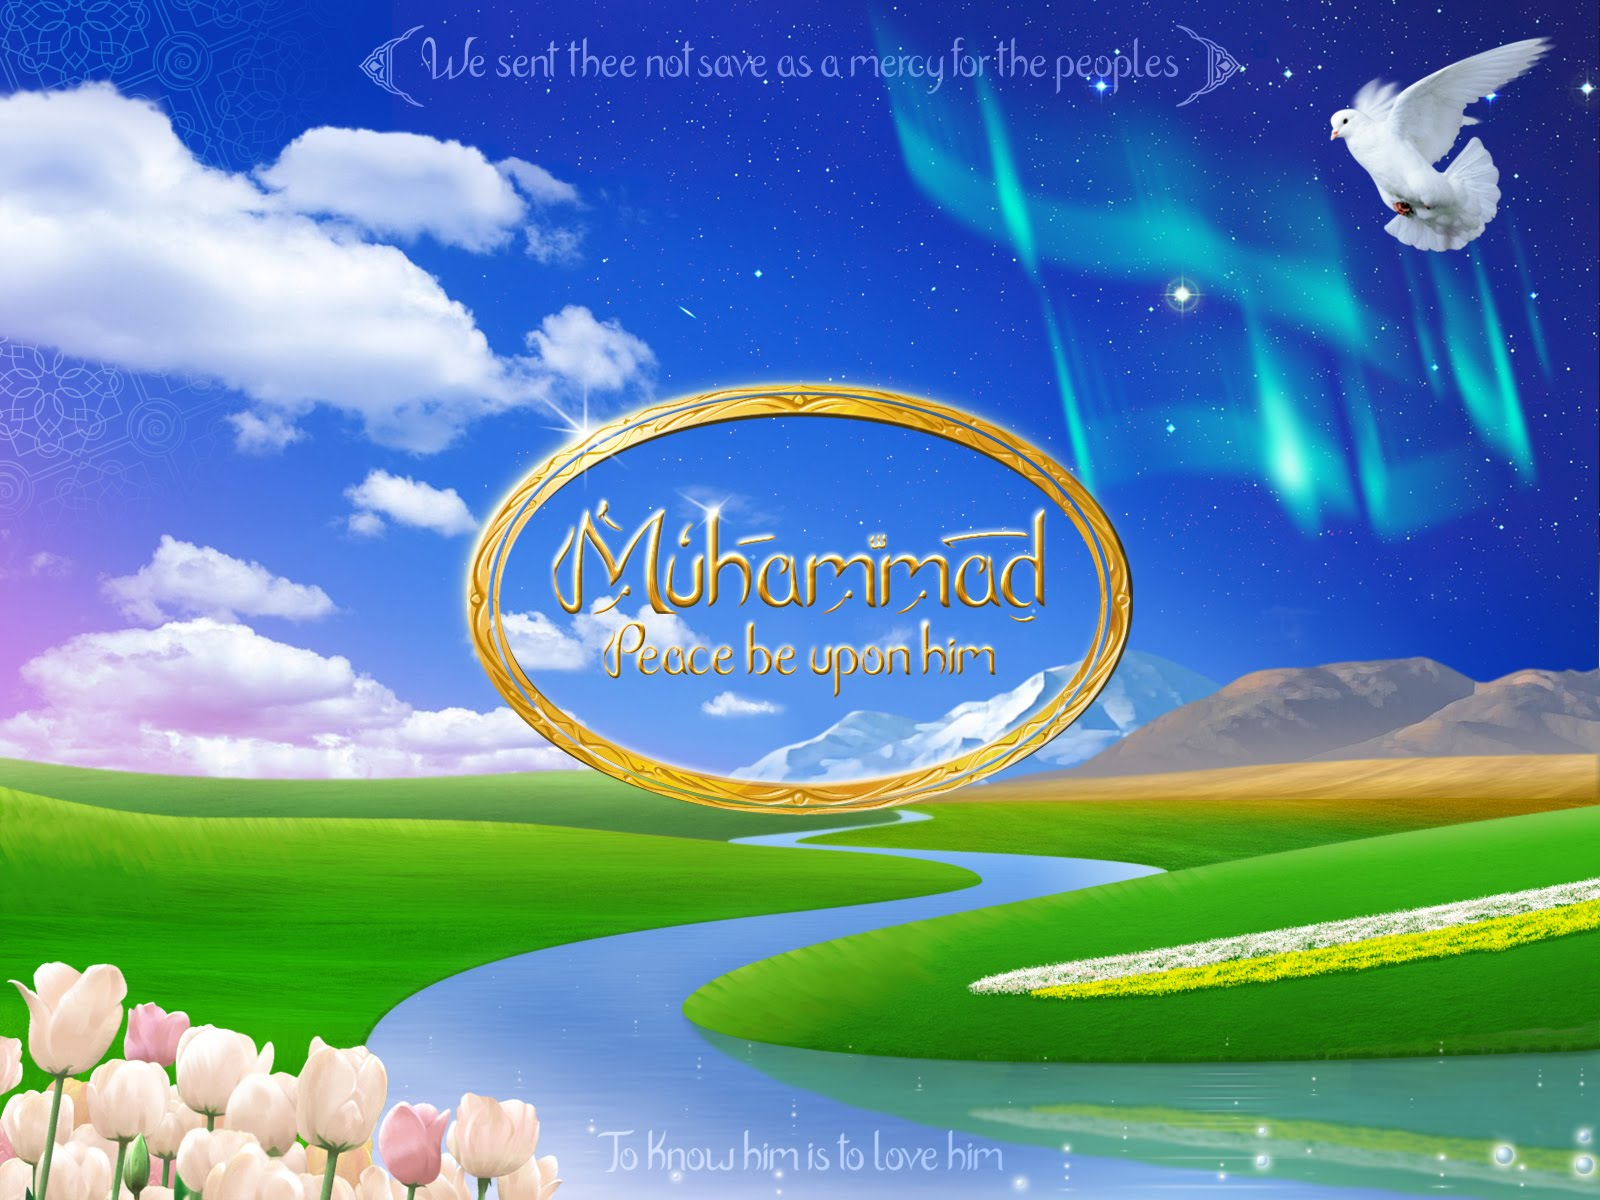 islamic wallpapers islamic art Ramadan%252BWallpapers%252B2010%25252C%252BIslamic%252BRamzan%252BDesktop%252BBackgrounds%252BSports%252BCar%252BWallpapers%252B2011%252B%252BFree%252BSports%252BCar%252BWallpapers%252B2011%252B%2525C2%2525B7%252BStones%252BWallpapers1%252B%2525281%252529 Wallpaper 2011 ramadan